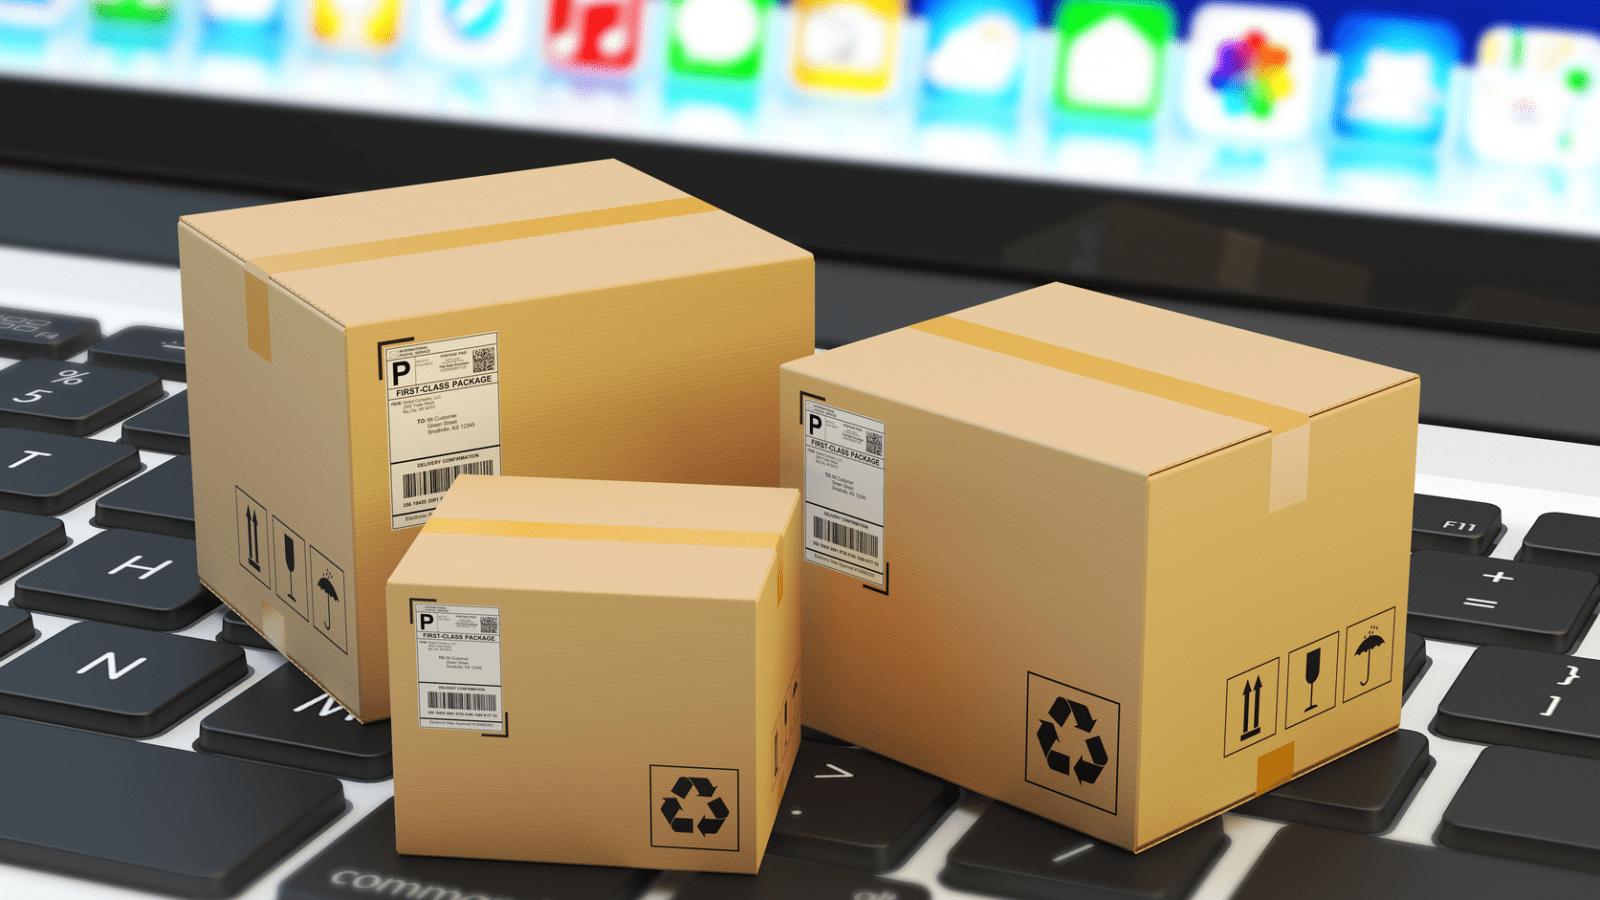 correios-encomendas-silgas-e-rastreio